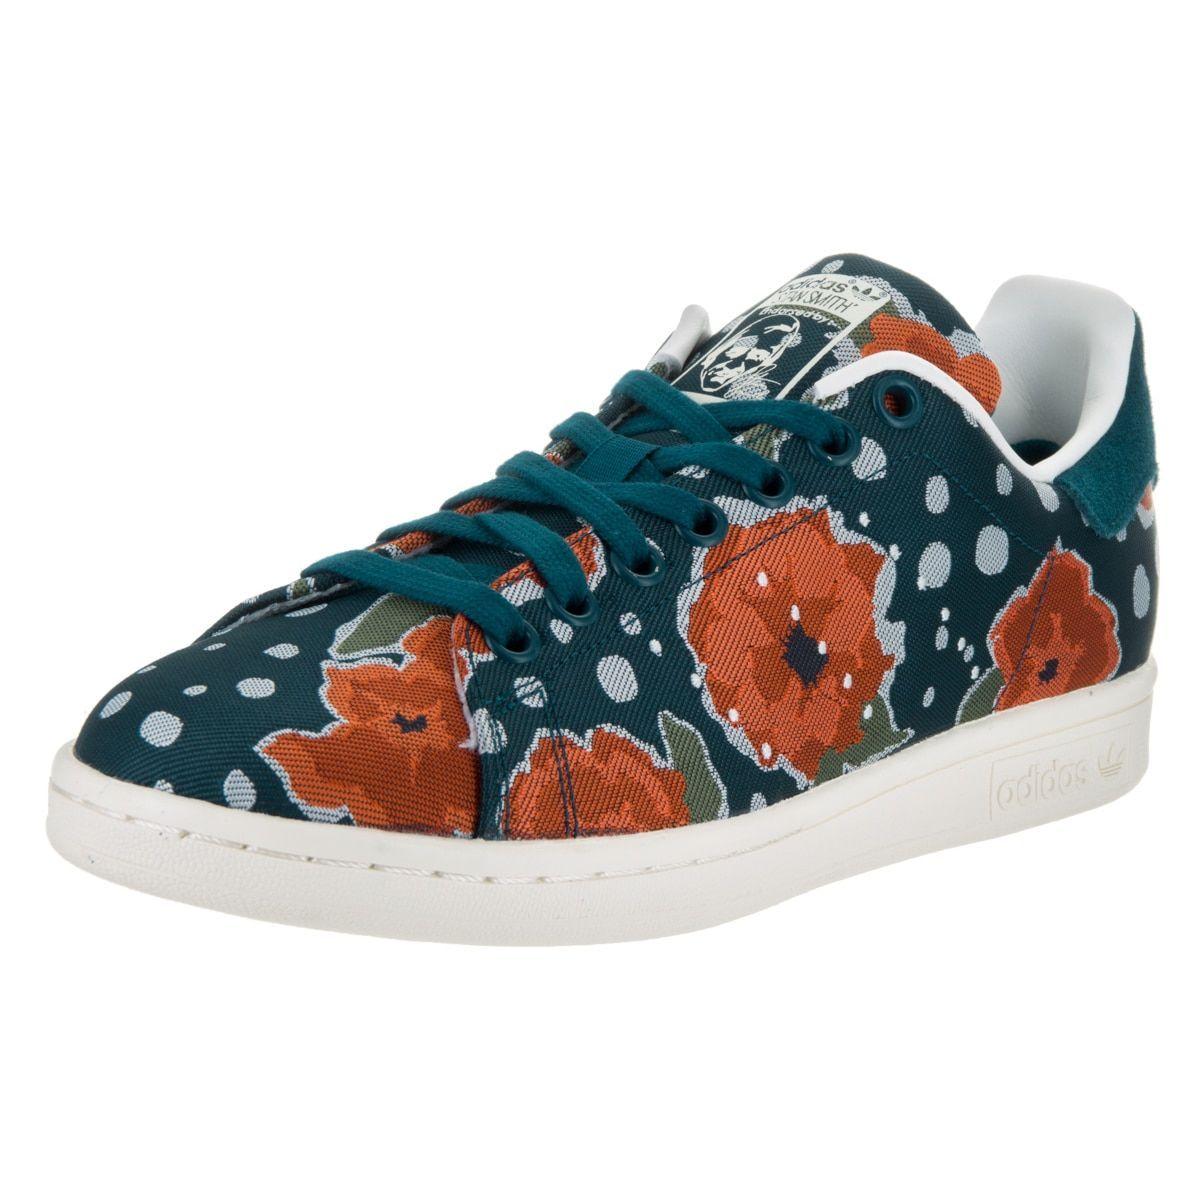 Adidas Damens's Schuhe Stan Smith W Originals coloROT Casual Schuhe Schuhe Damens's 04c347